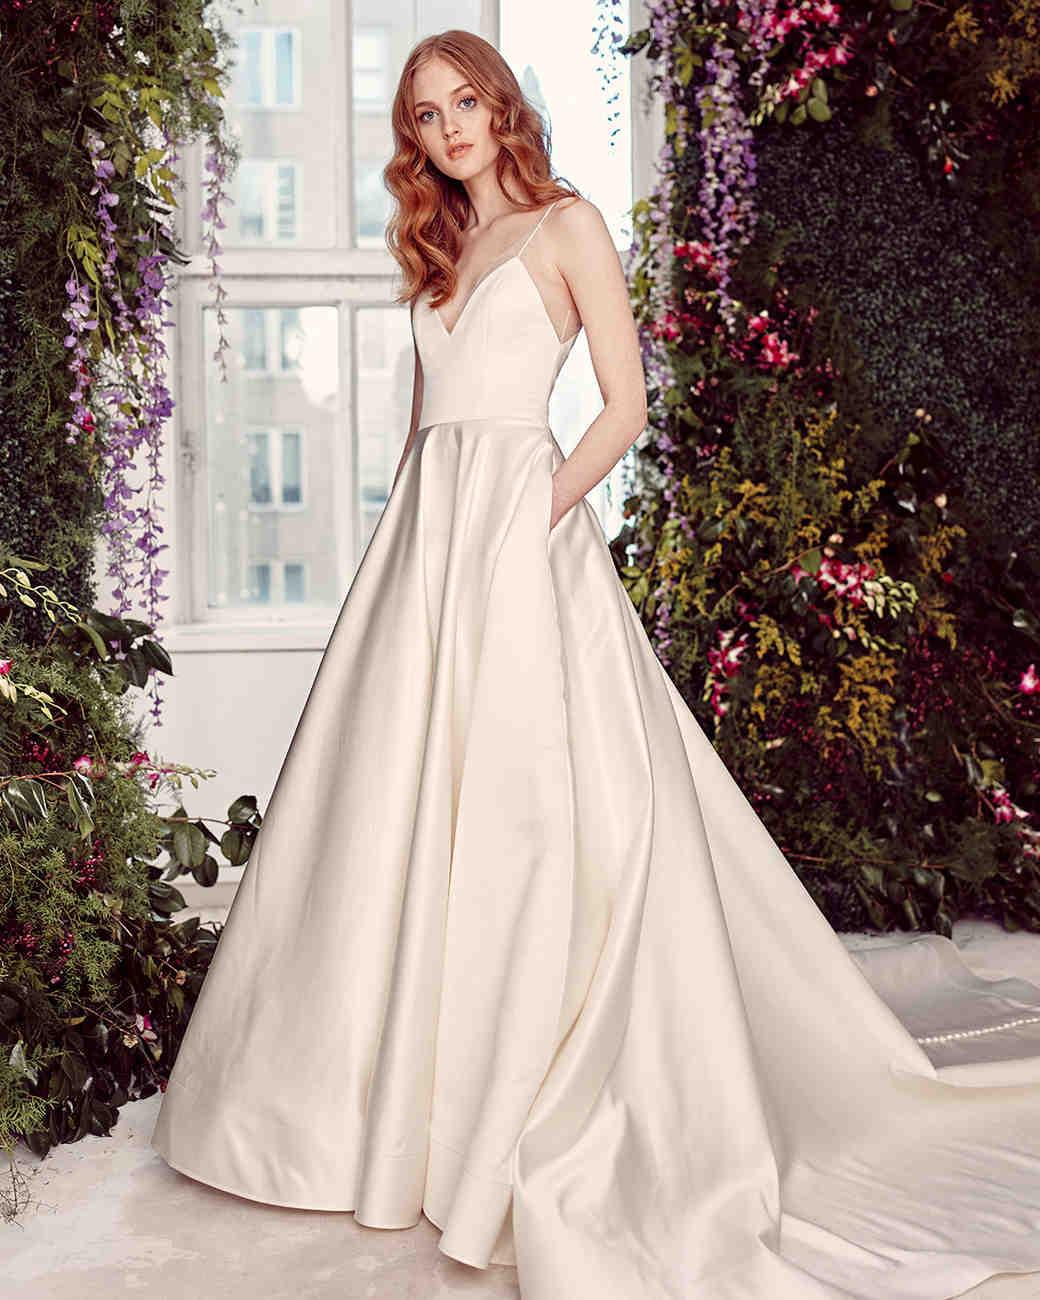 Alyne By Rita Vinieris Spring 2020 Wedding Dress